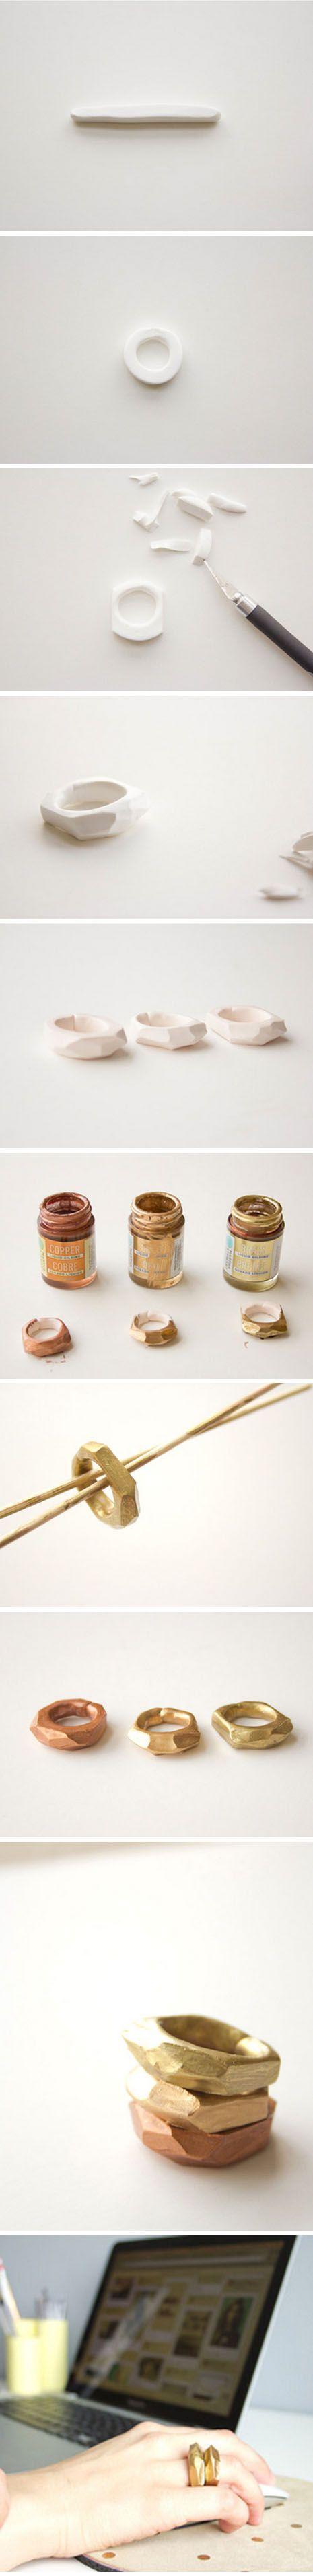 #handmadering geometric polymer clay ring - Anello geometrico in argilla polimerica